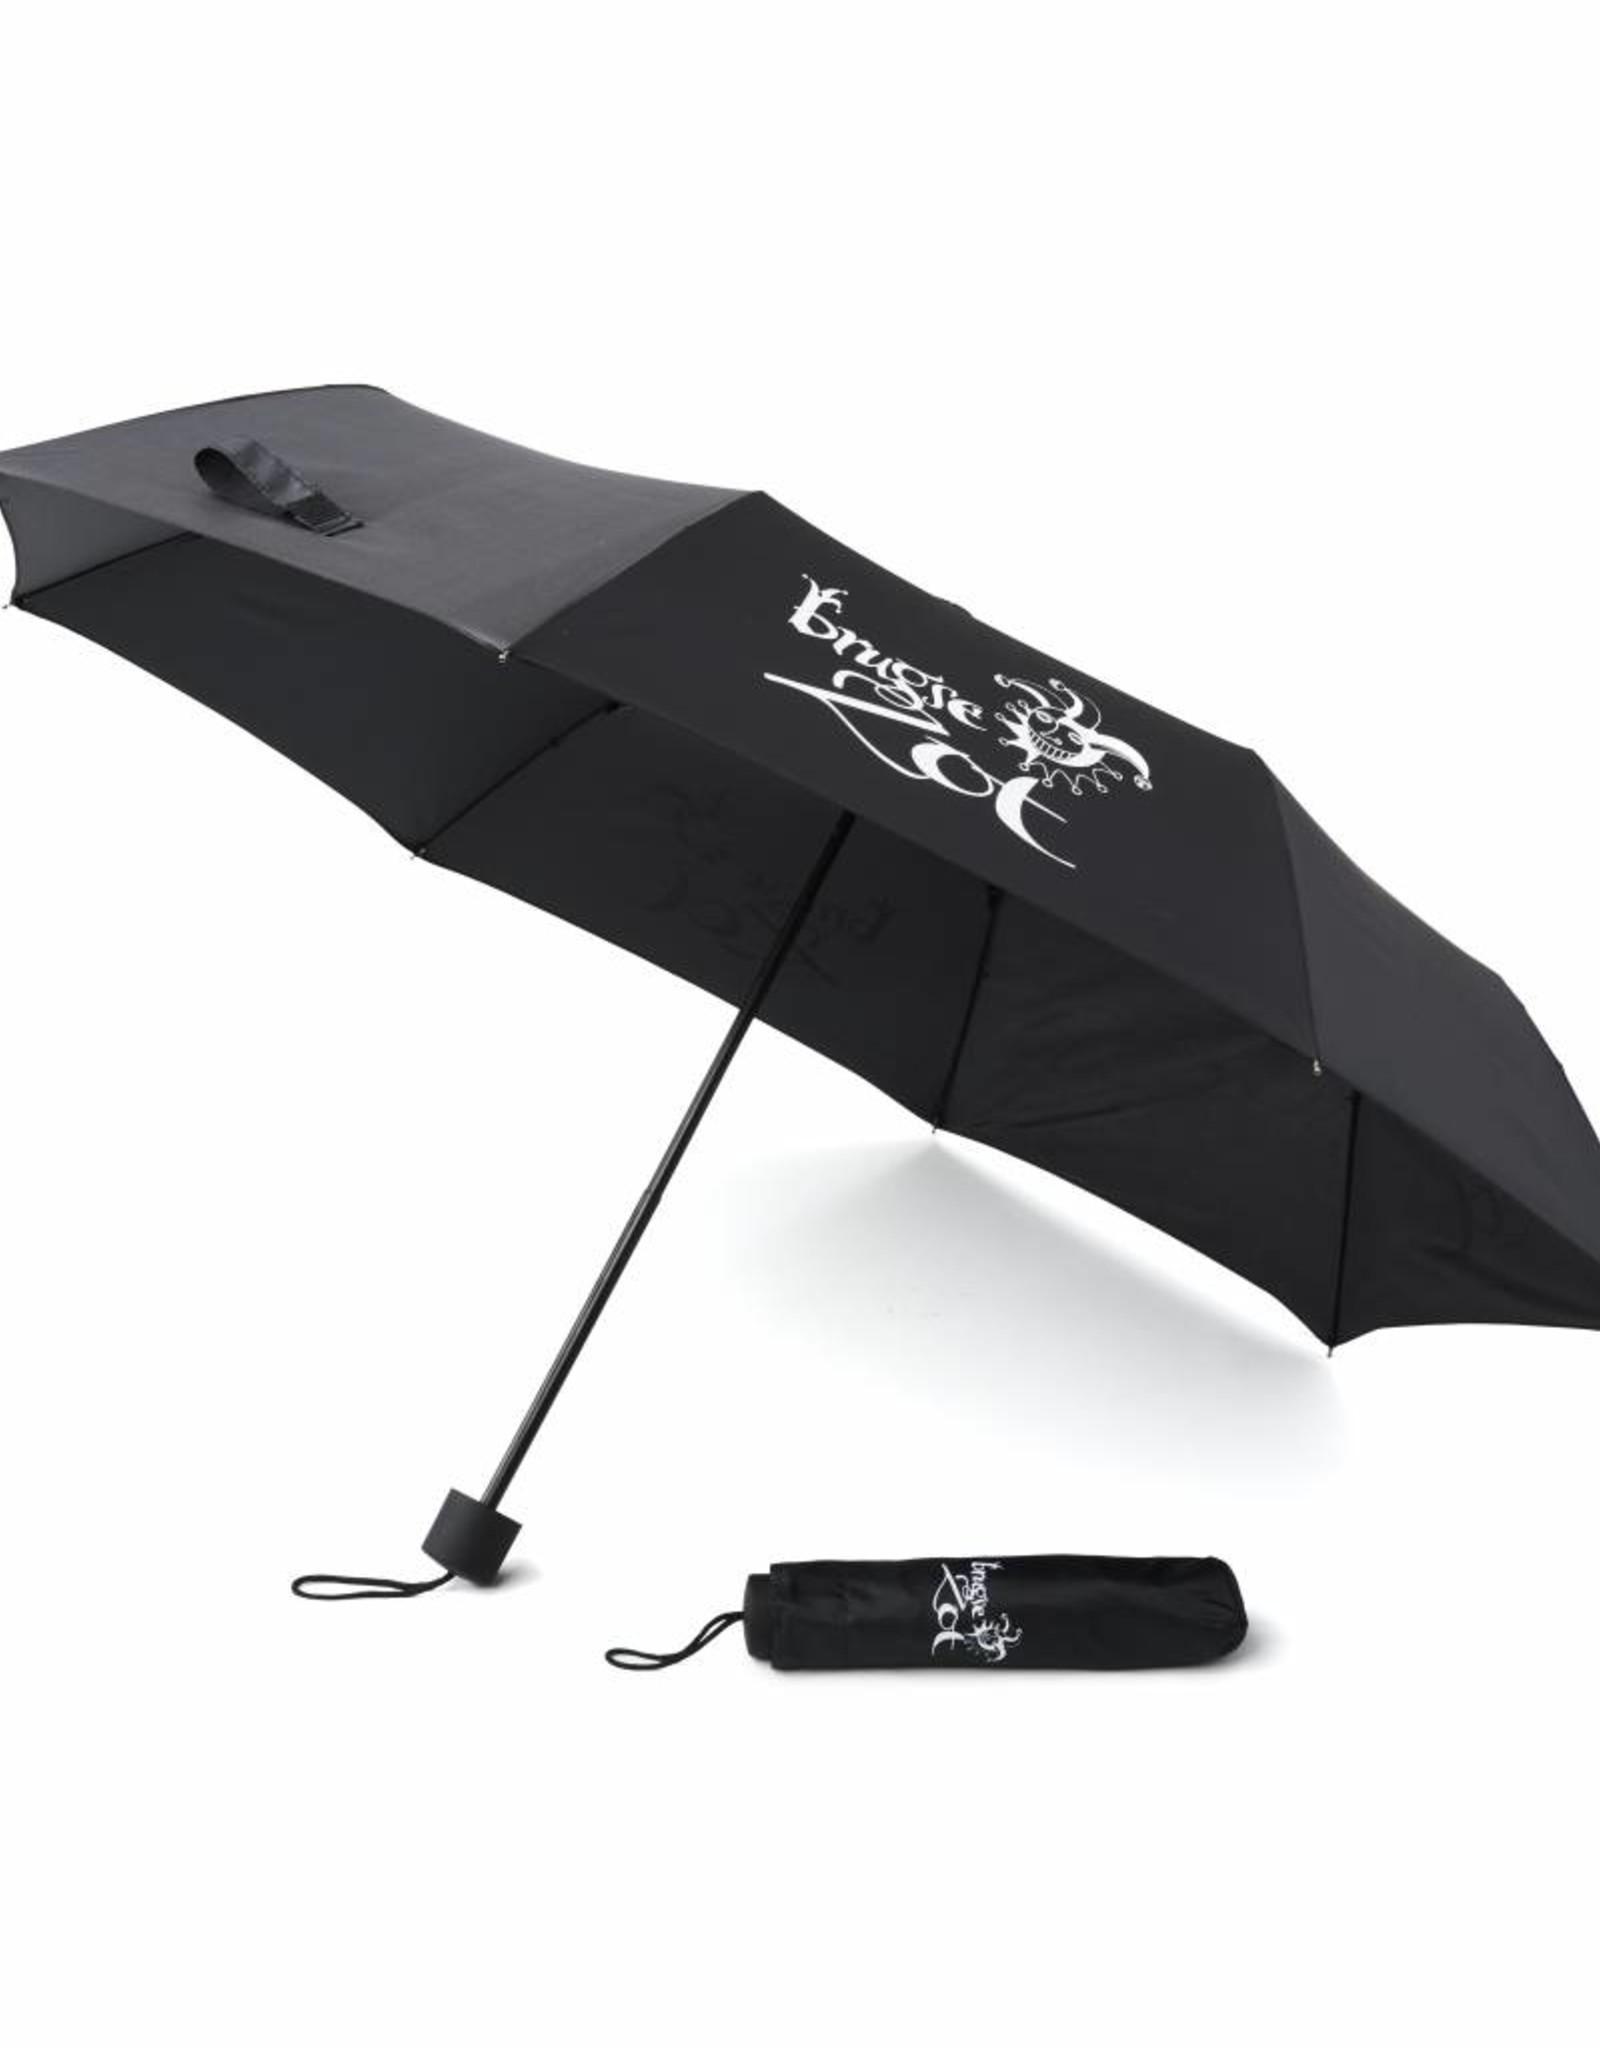 Brugse Zot paraplui